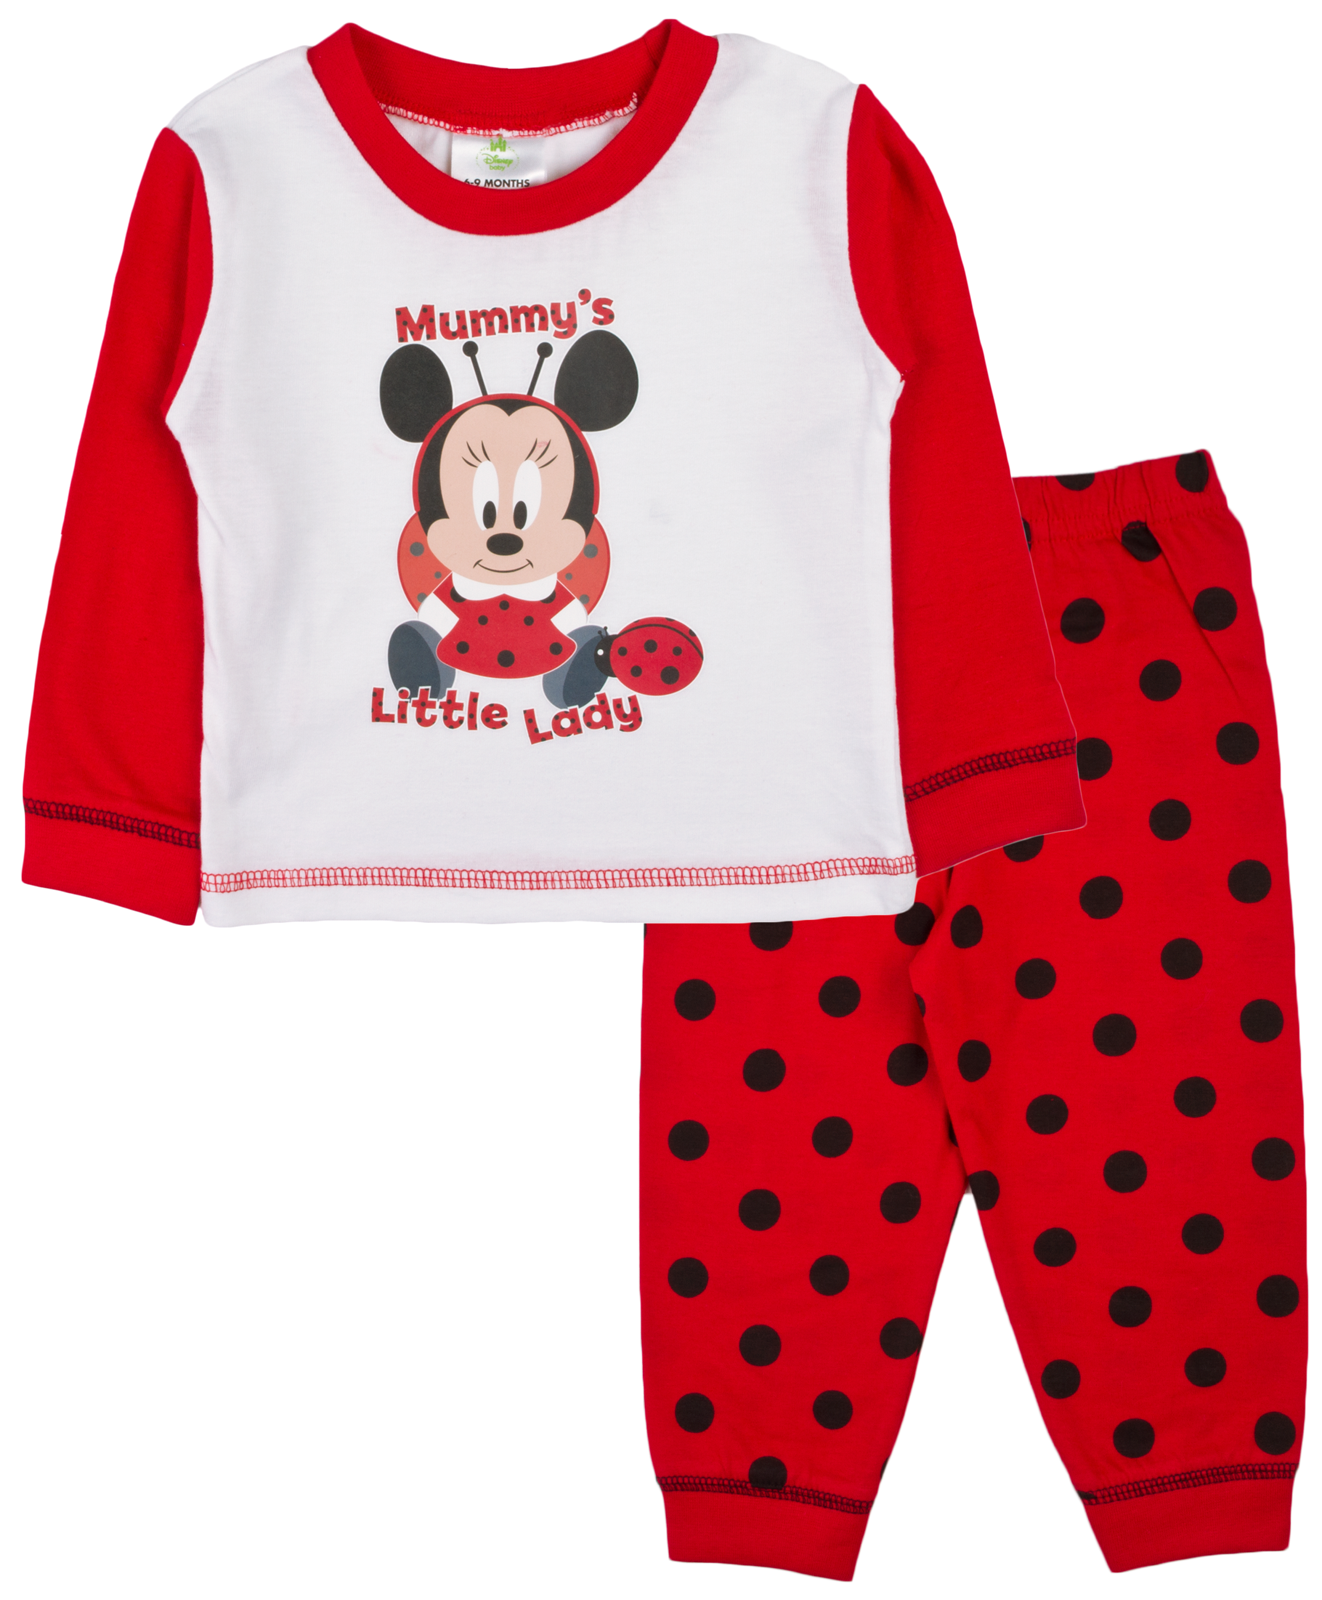 Baby Girls Pyjamas Kids Toddlers Disney Minnie Mouse Pjs Set Me To ... 82299a410